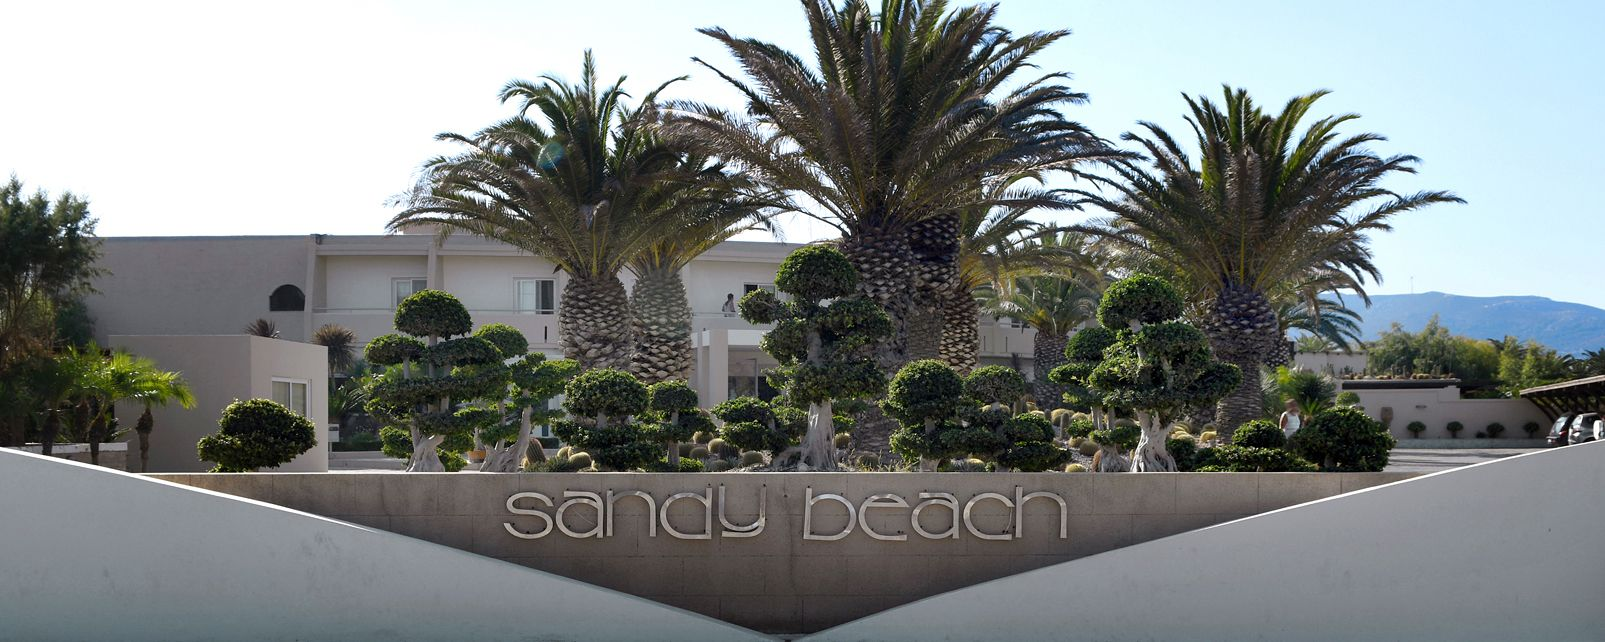 Hôtel Sandy Beach Hotel